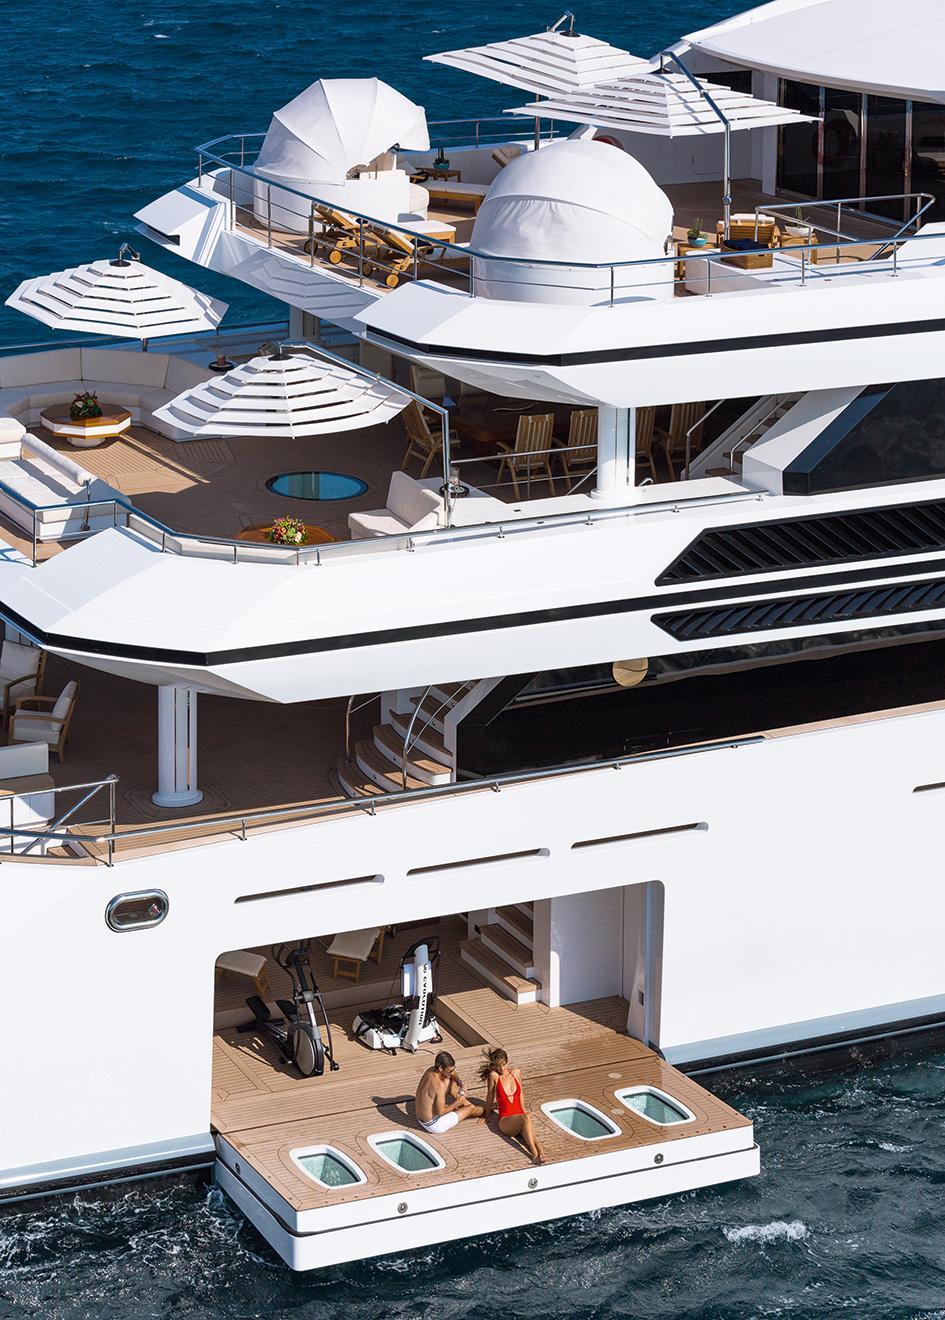 Irimari: an impressive six-deck vessel